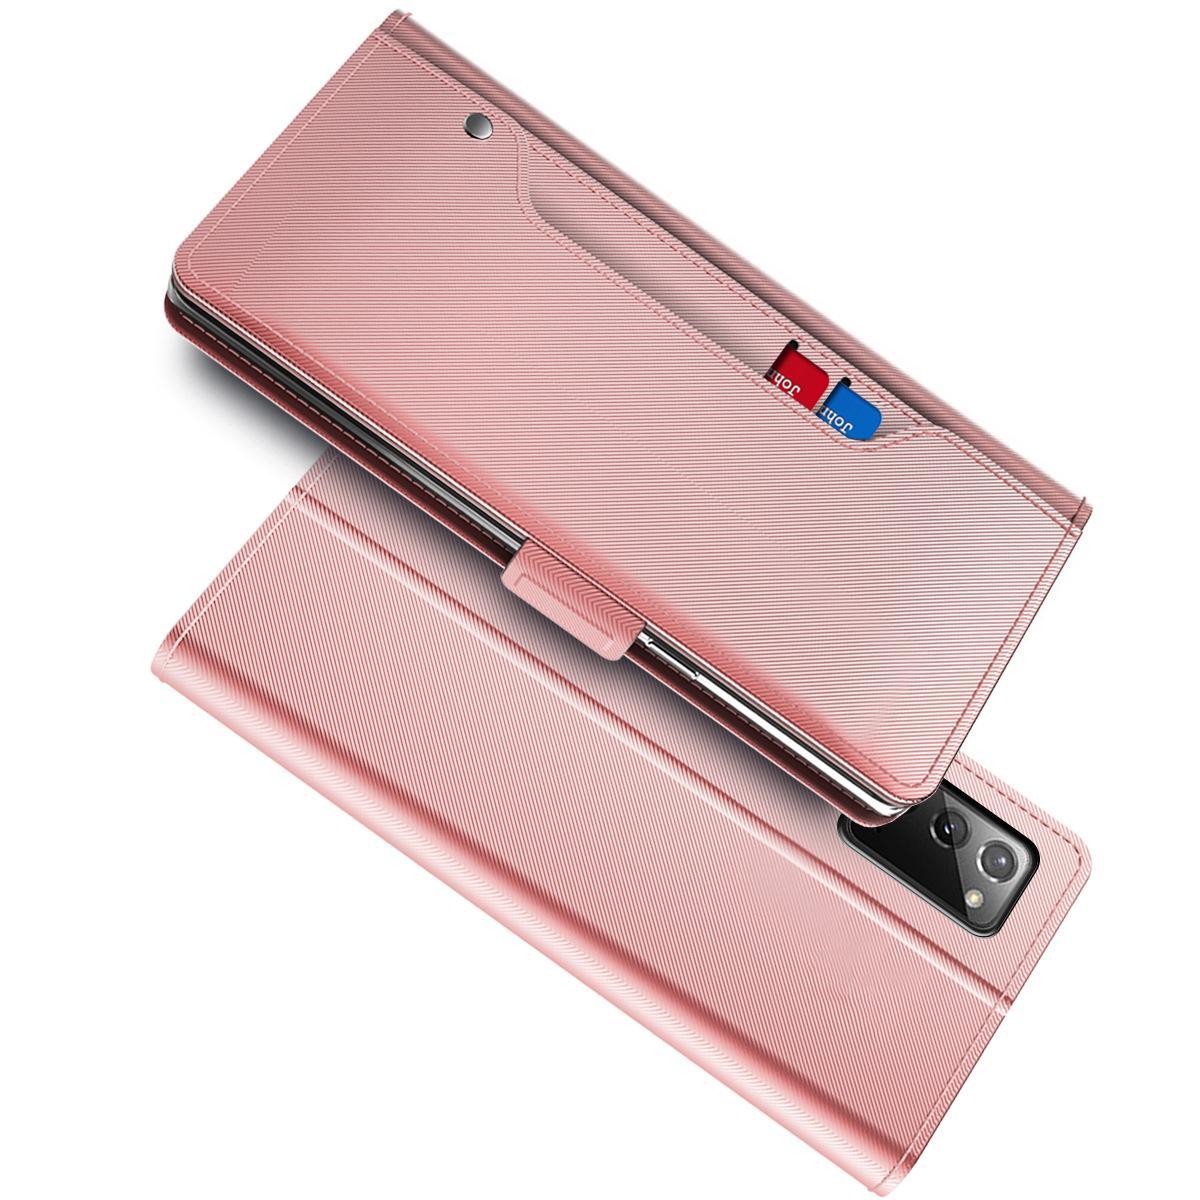 Suojakotelo Peili Galaxy Note 20 Ultra Vaaleanpunainen